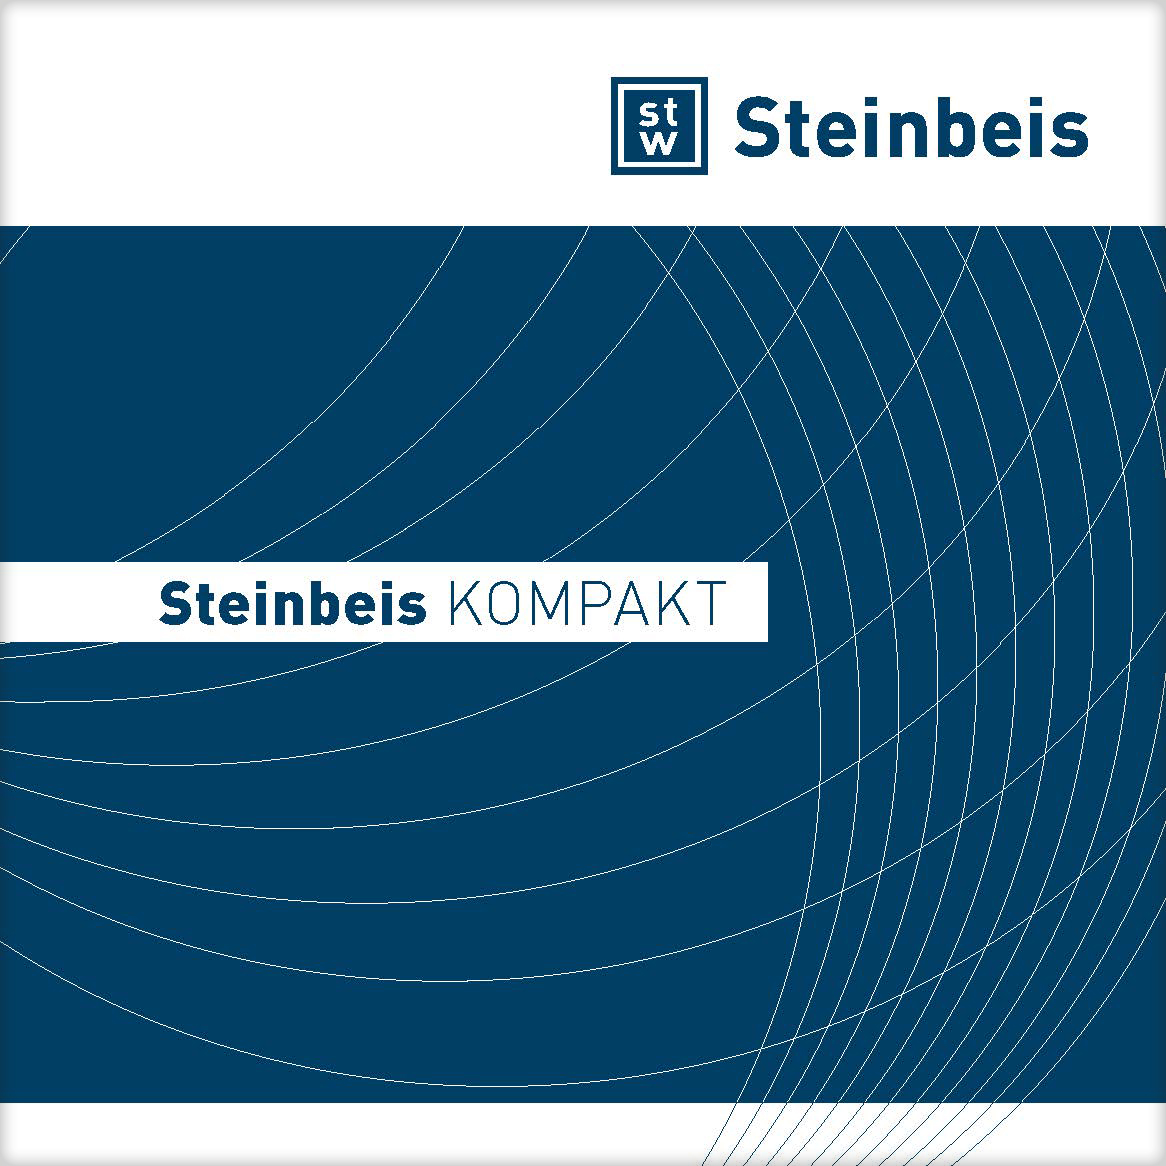 Steinbeis Kompakt